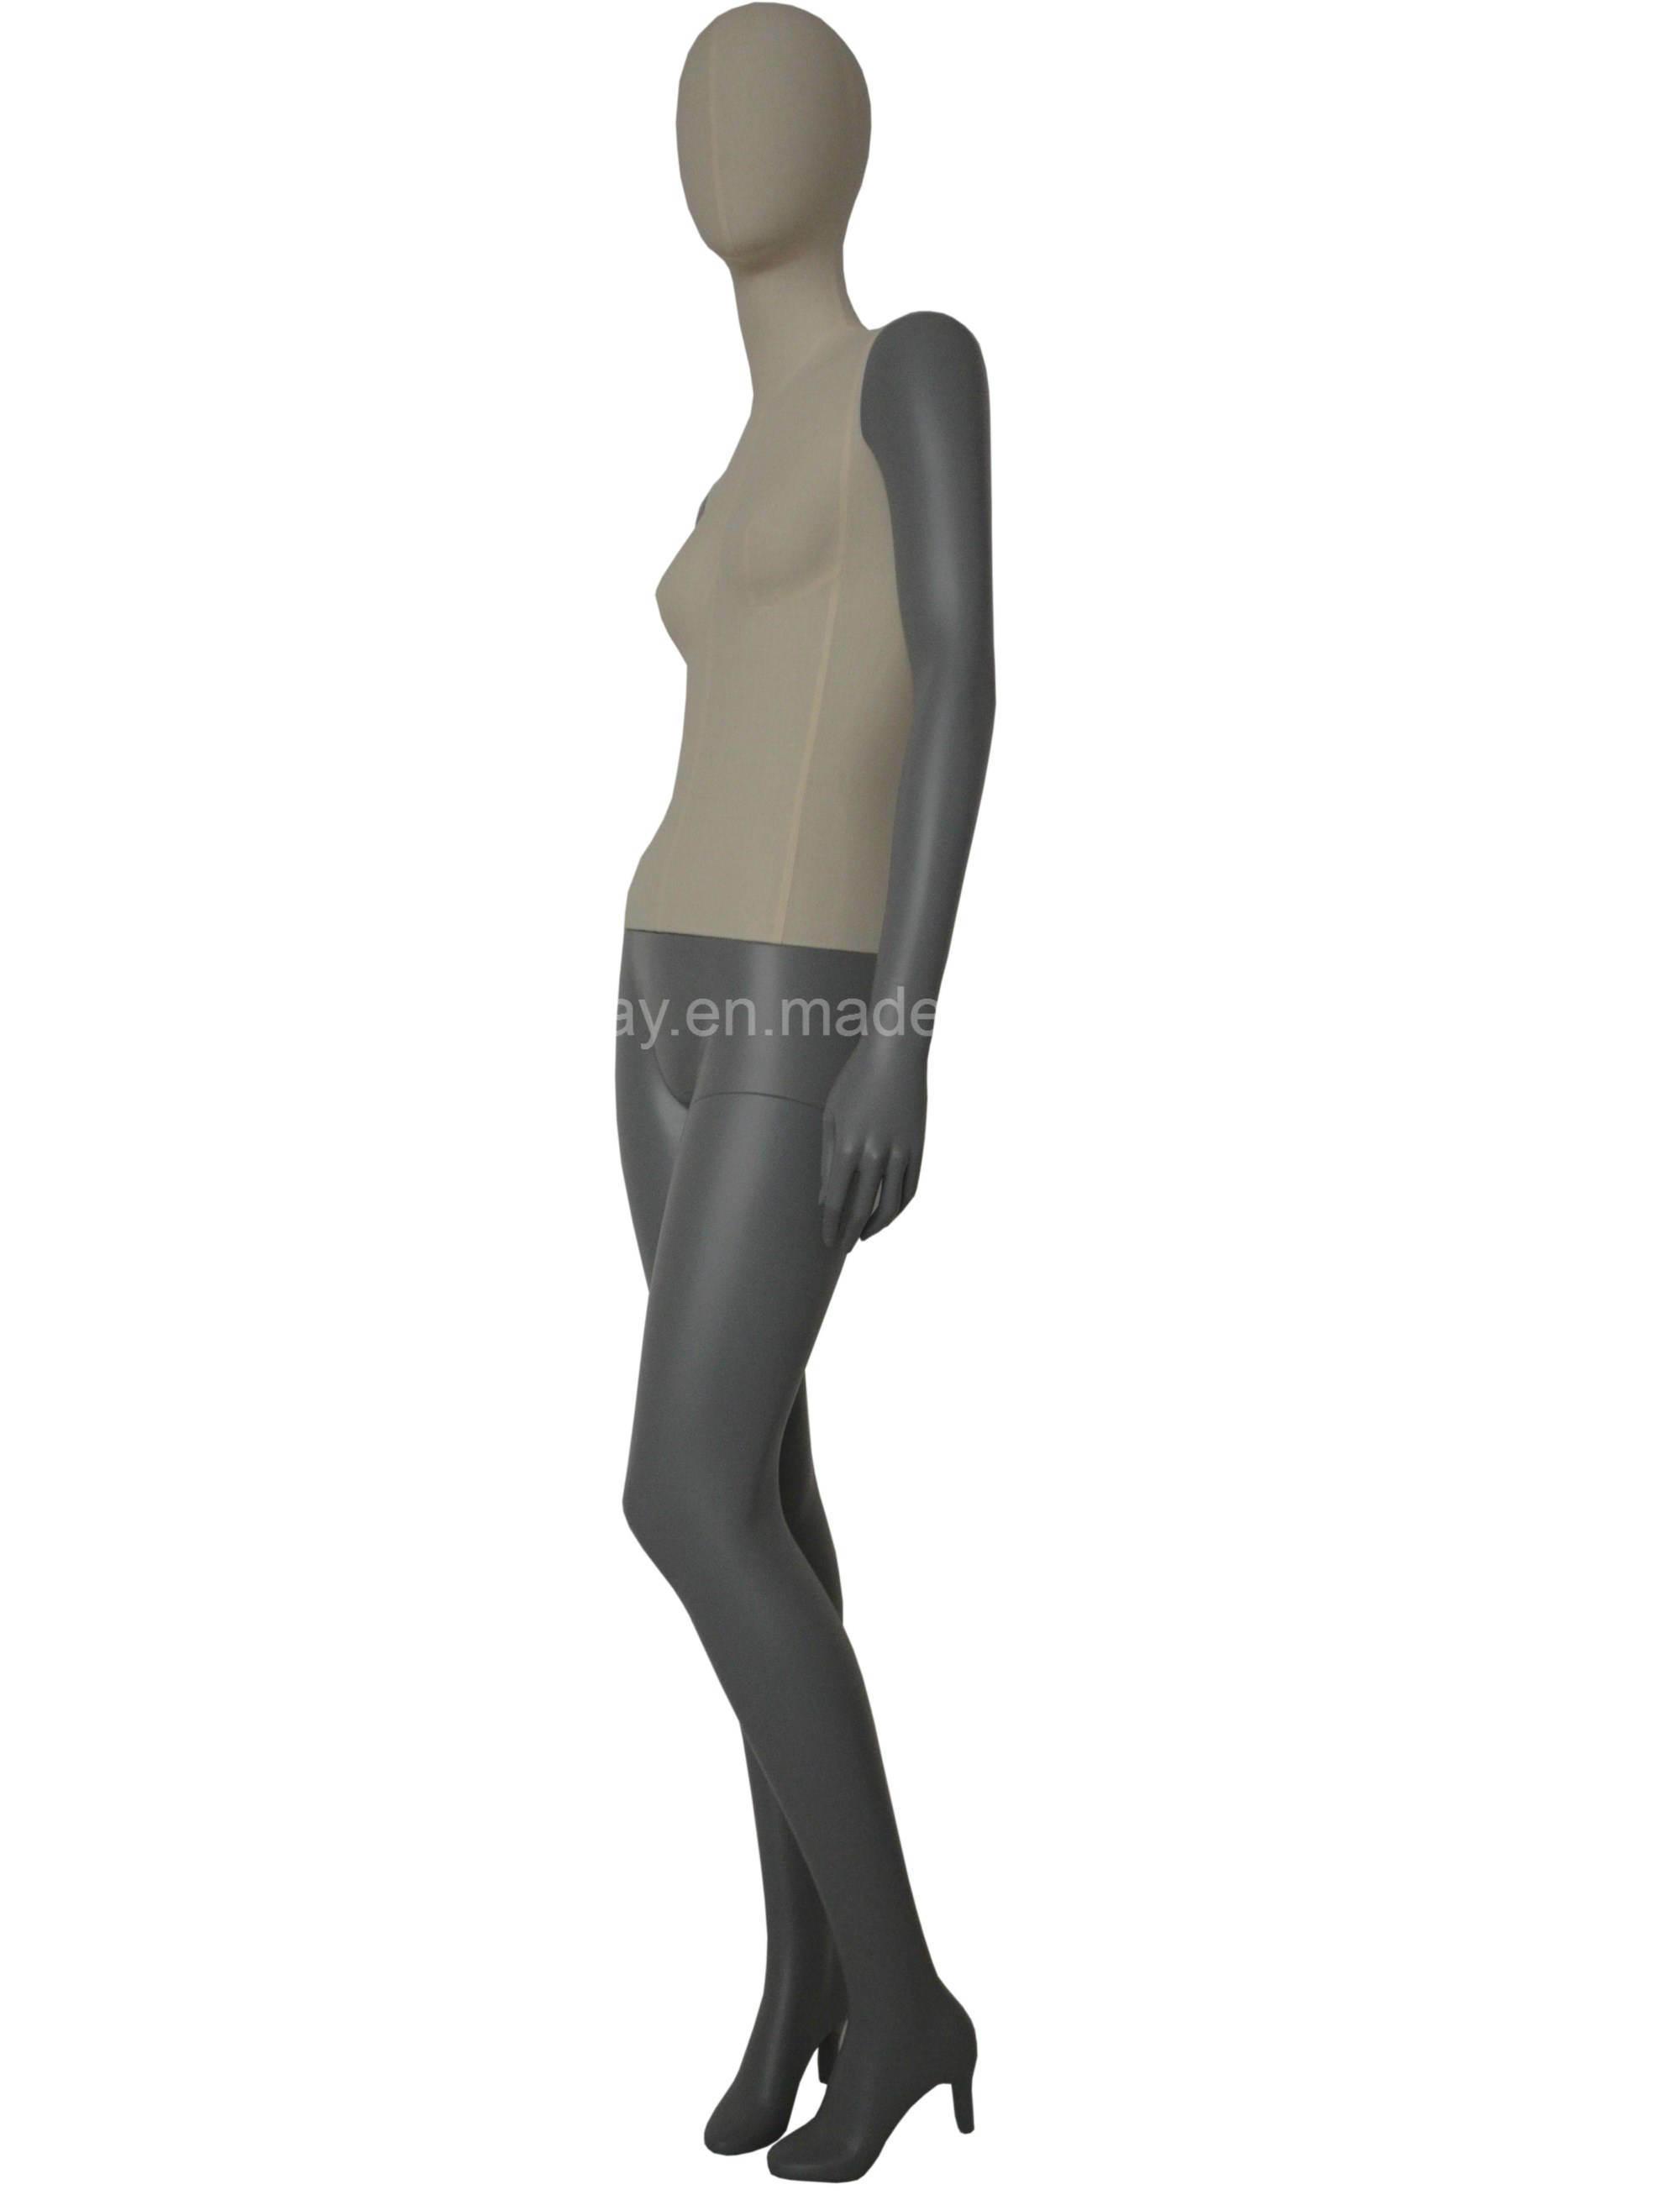 Tailor Mannequin for Windows Decoration